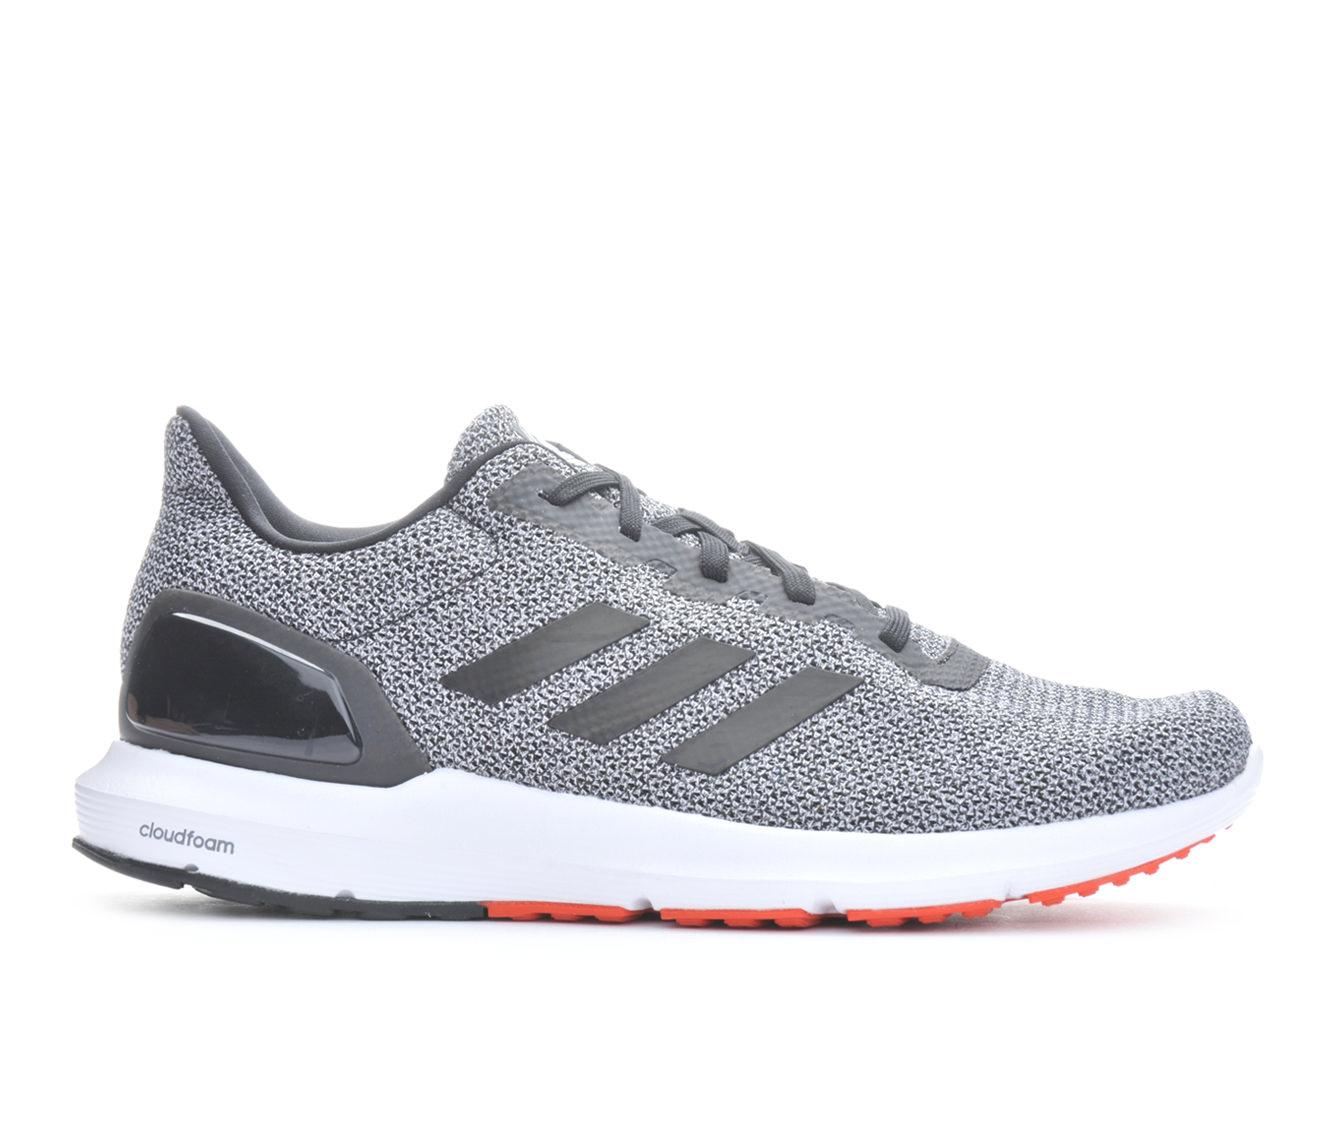 Men's Adidas Cosmic 2 SL Running Shoes (Grey - Size 8) 1655110